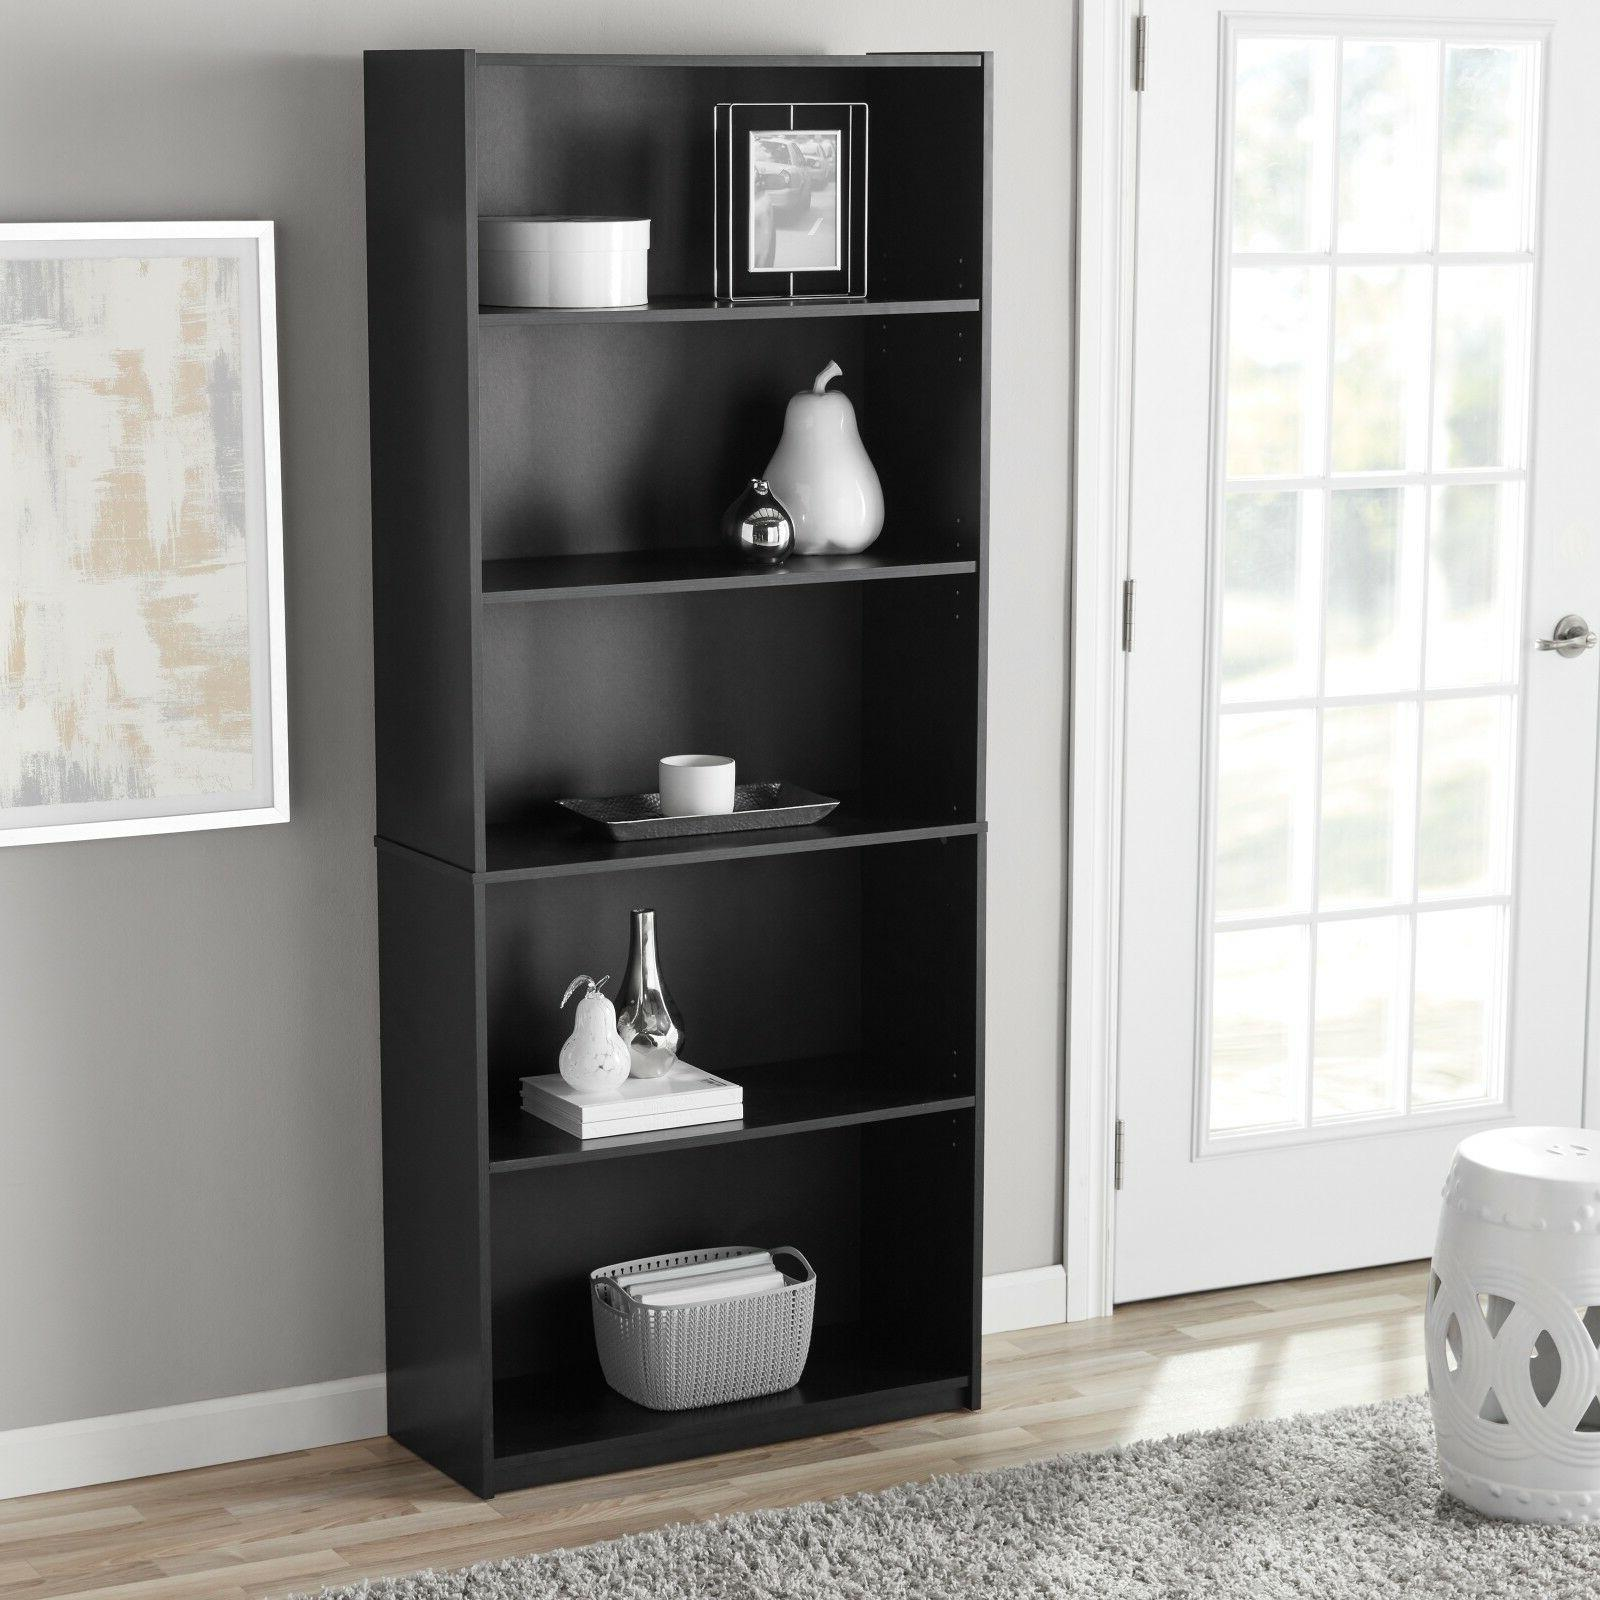 5-Shelf Adjustable Wood Bookcase Book Storage Shelving Books